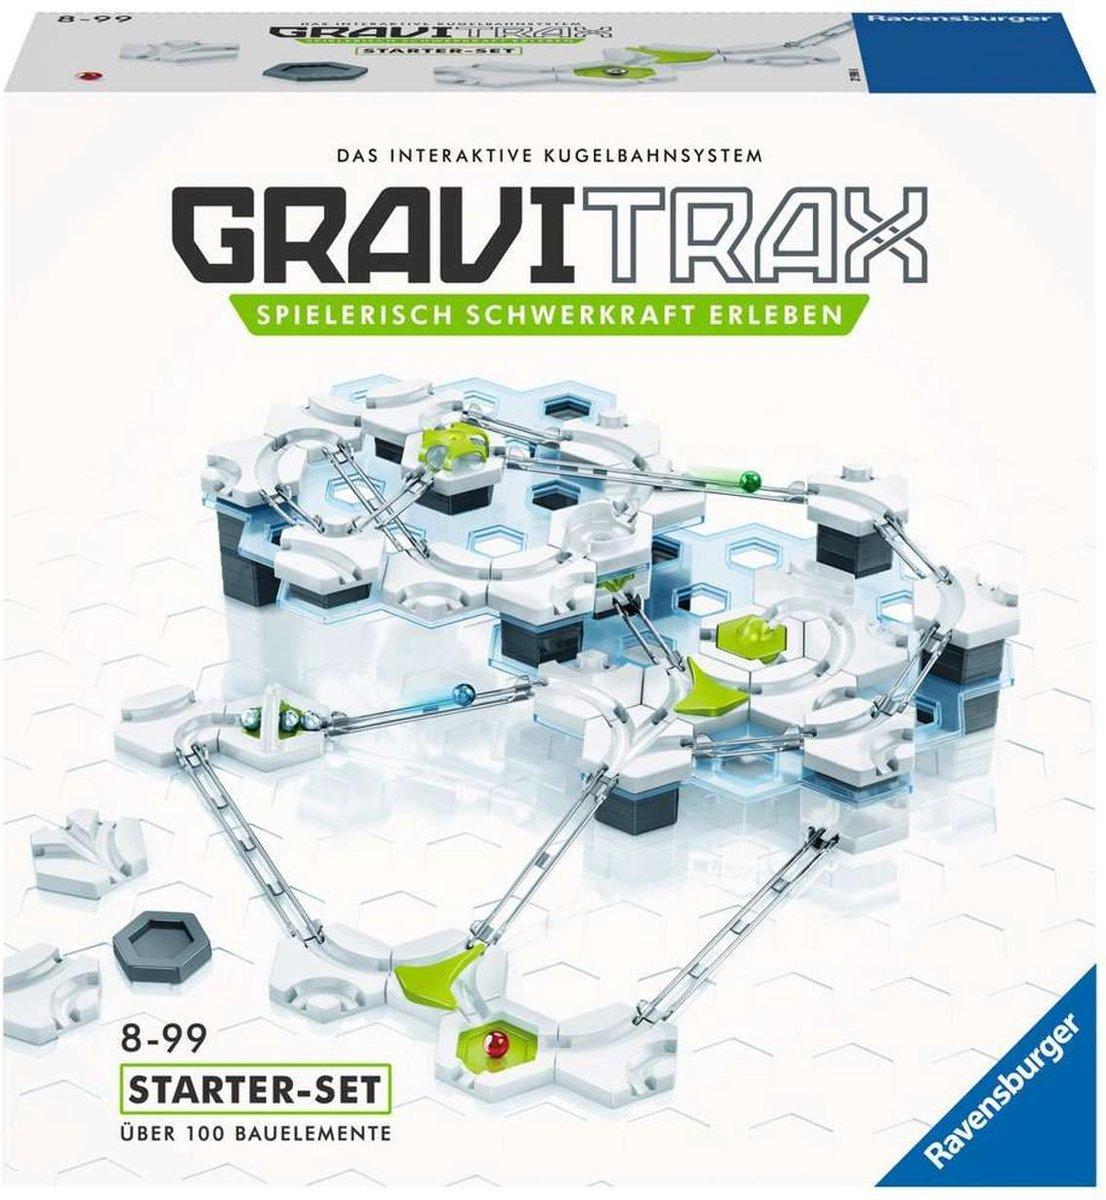 Gravitrax Starterset - Poolstalig